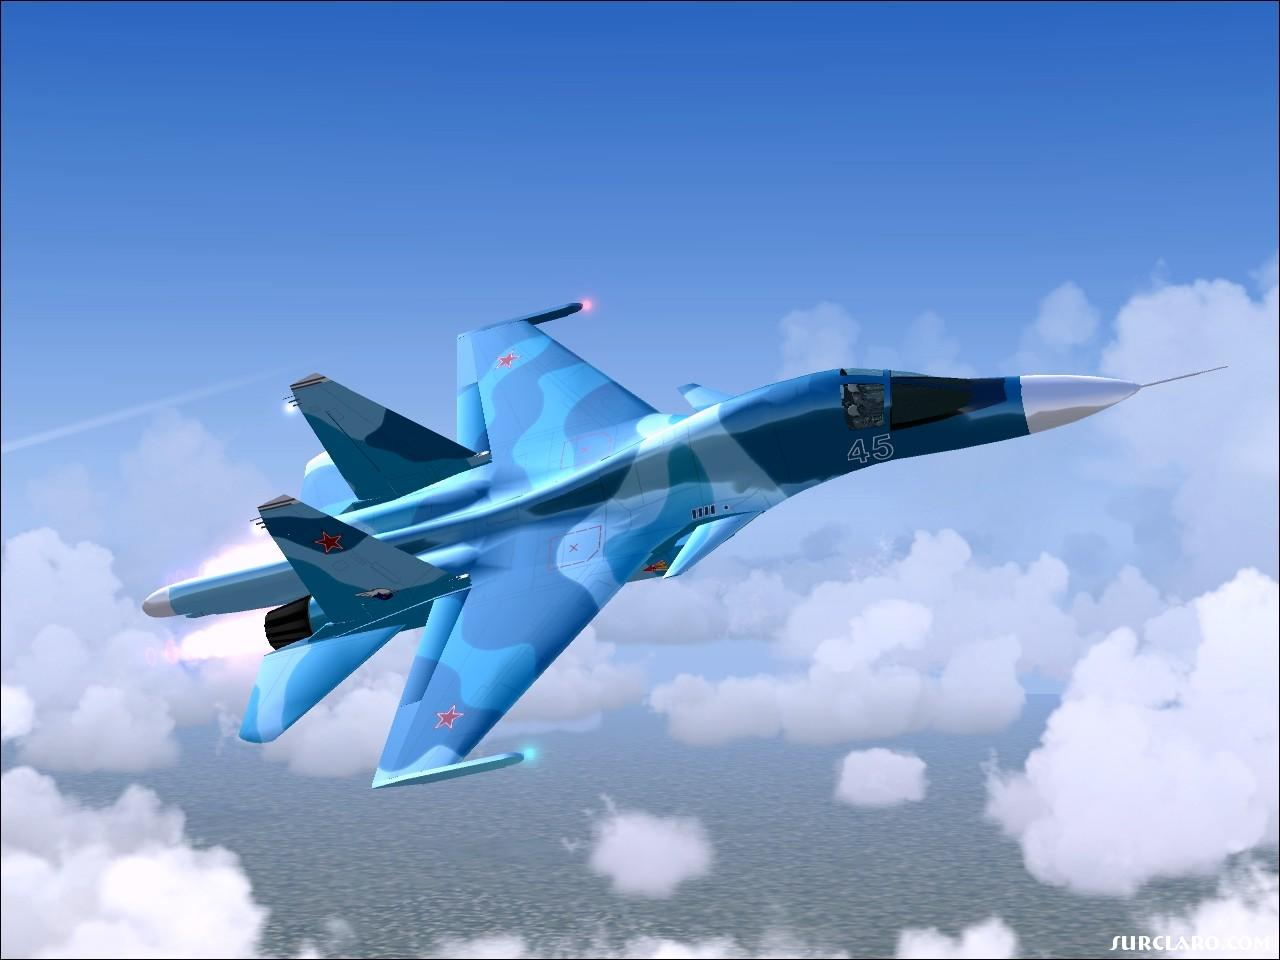 Su 34 (航空機)の画像 p1_27